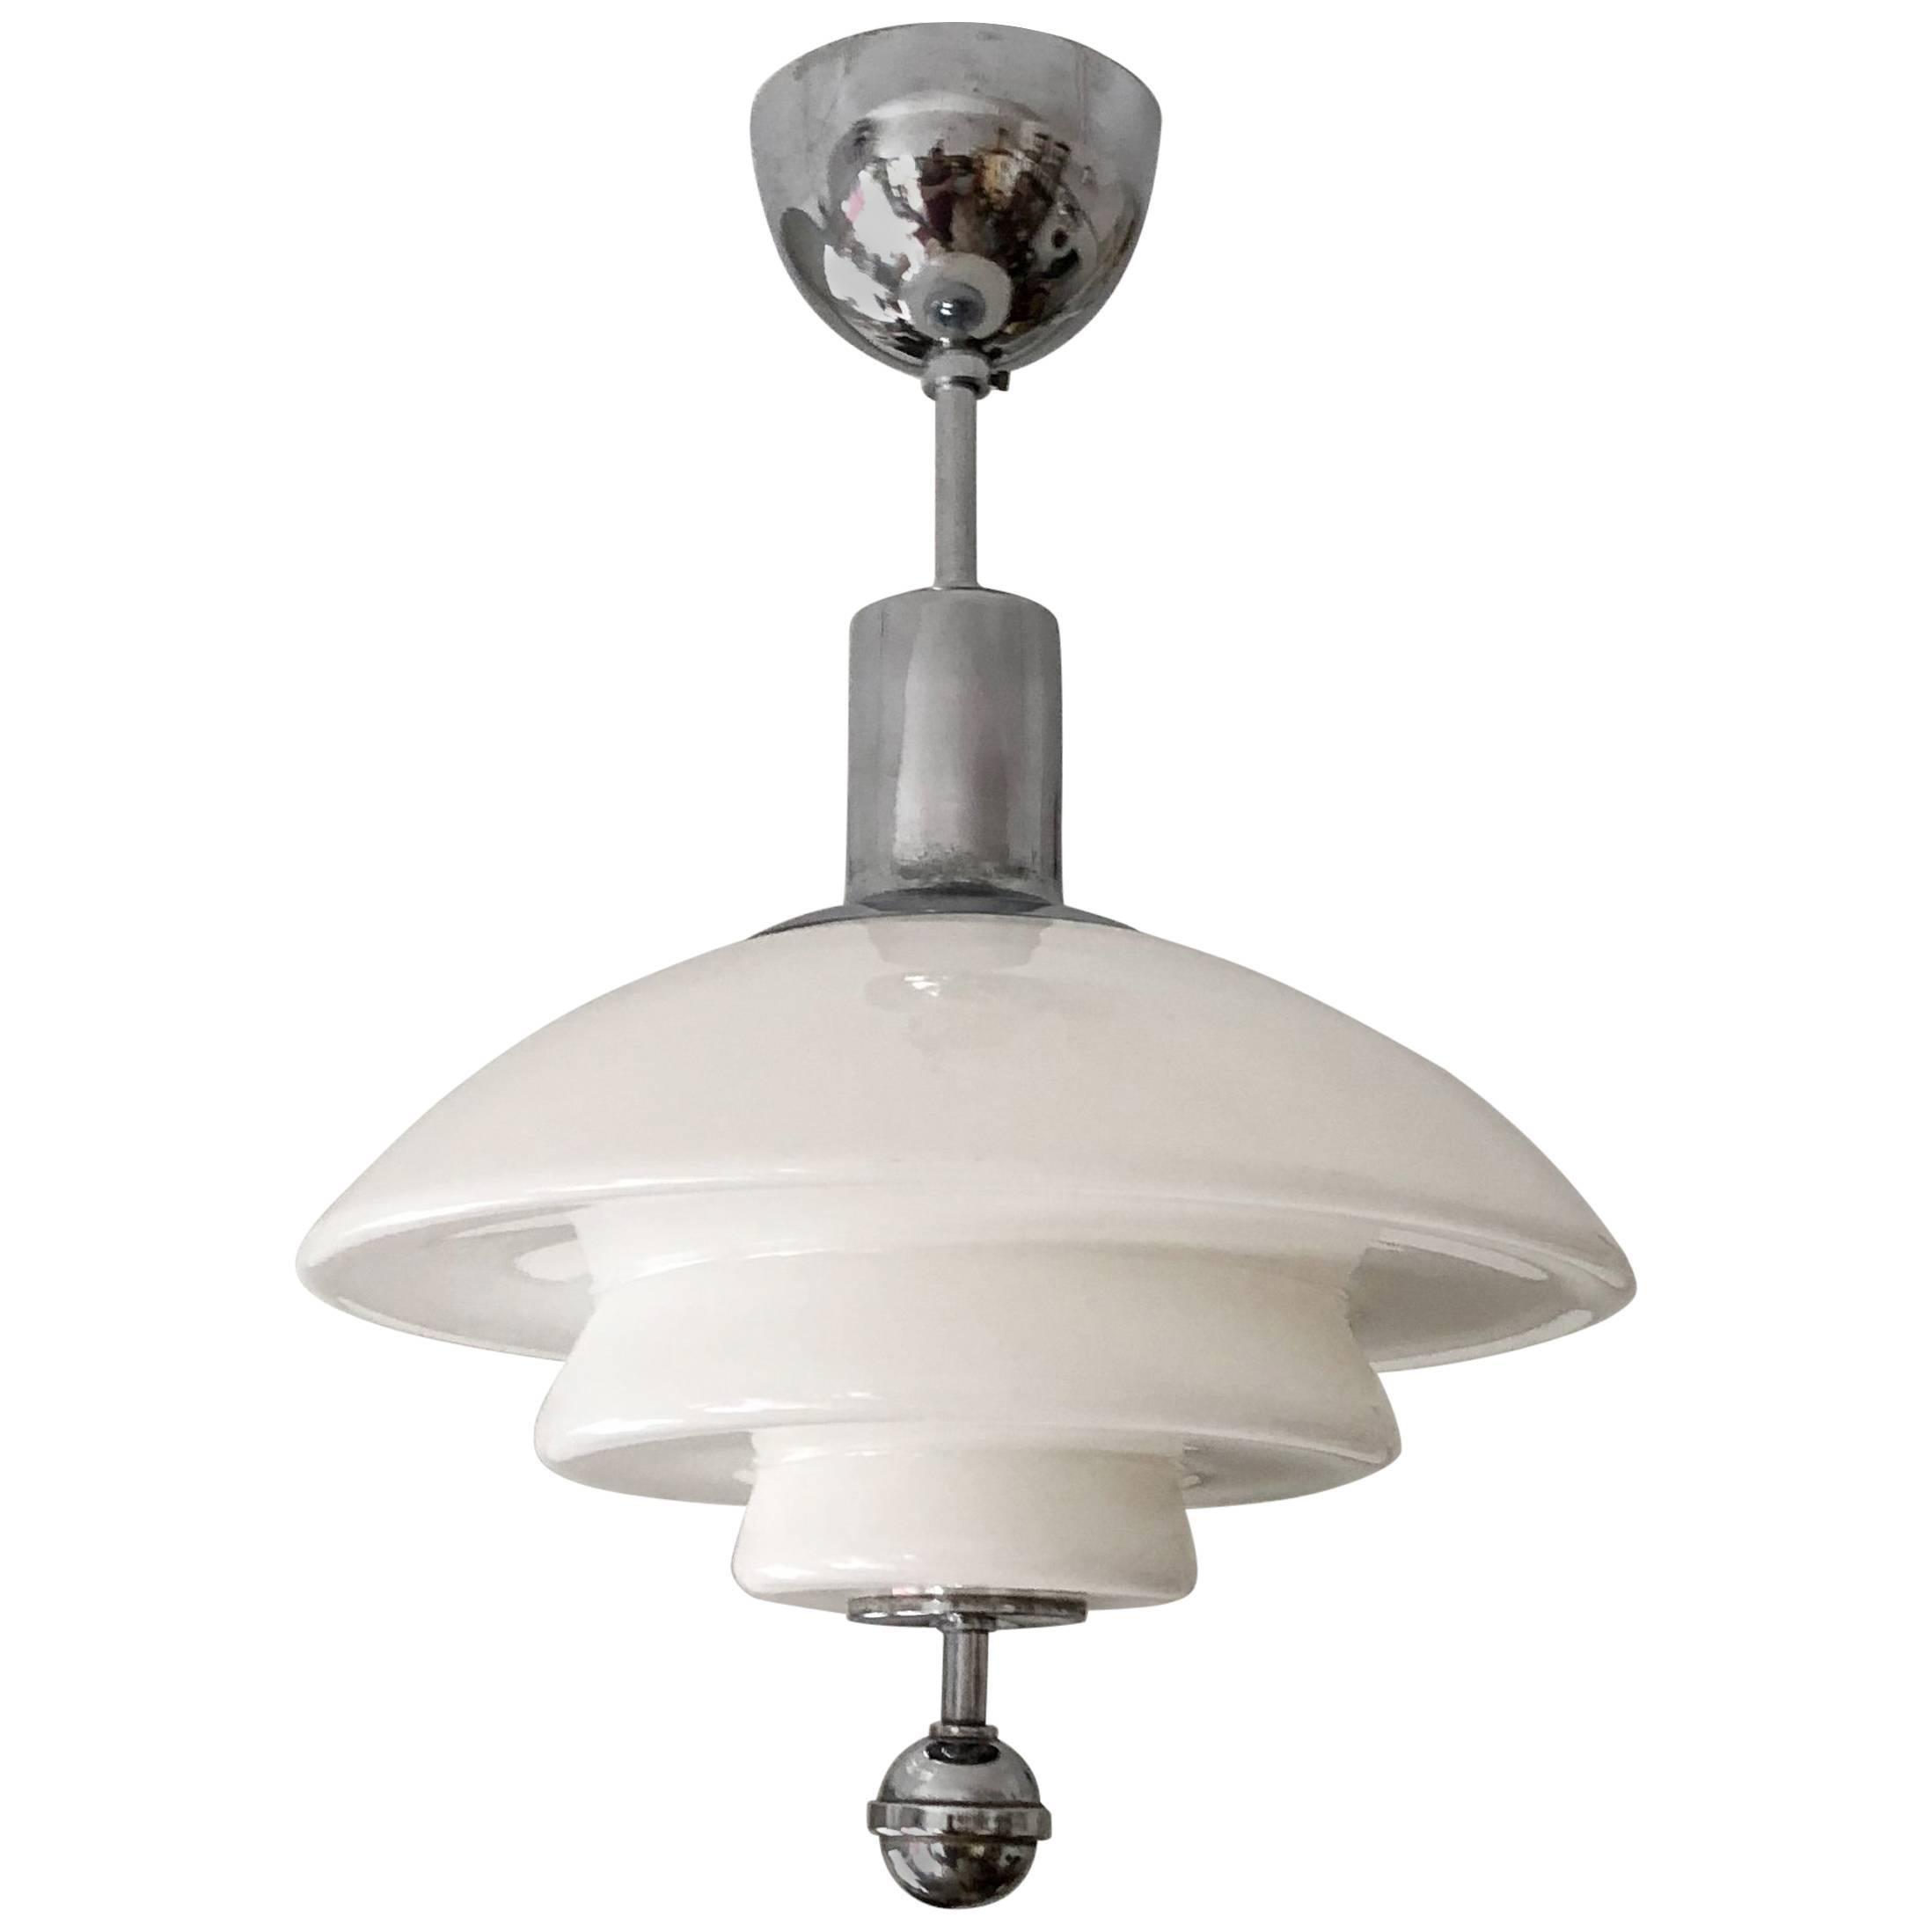 Otto Muller Style Bauhaus Opaline Glass Pendant Lamp